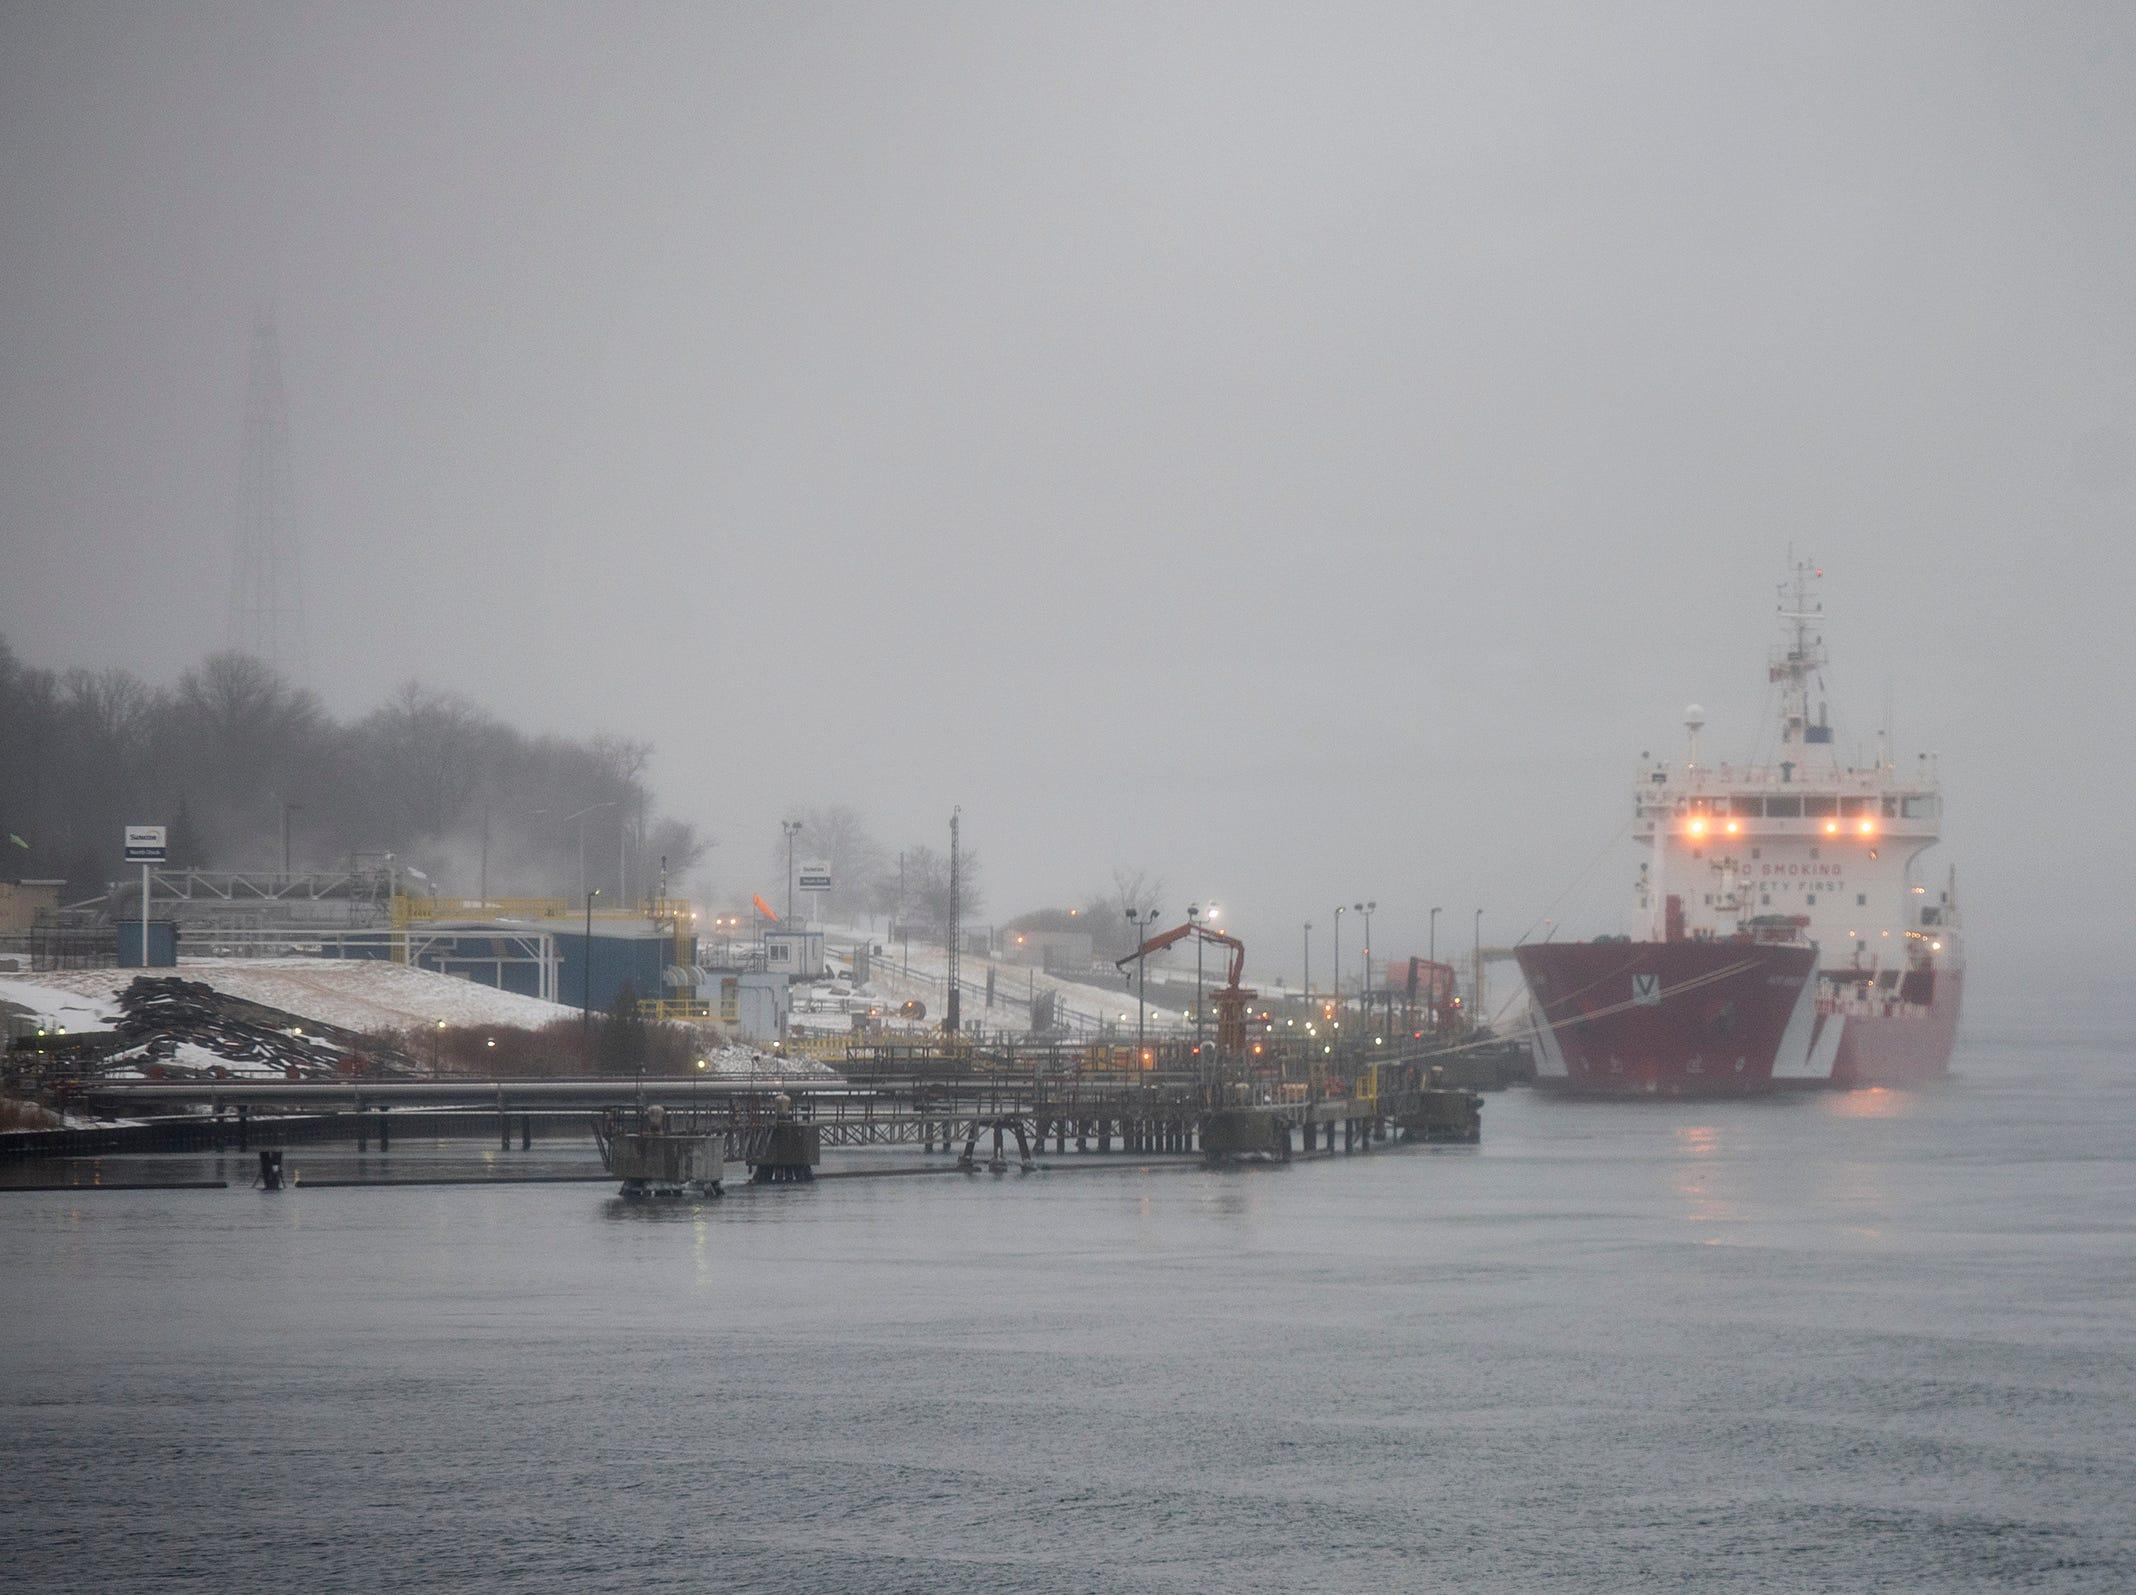 A freighter is seen through the fog docked near Sarnia, ON, Wednesday, Feb. 20, 2019.